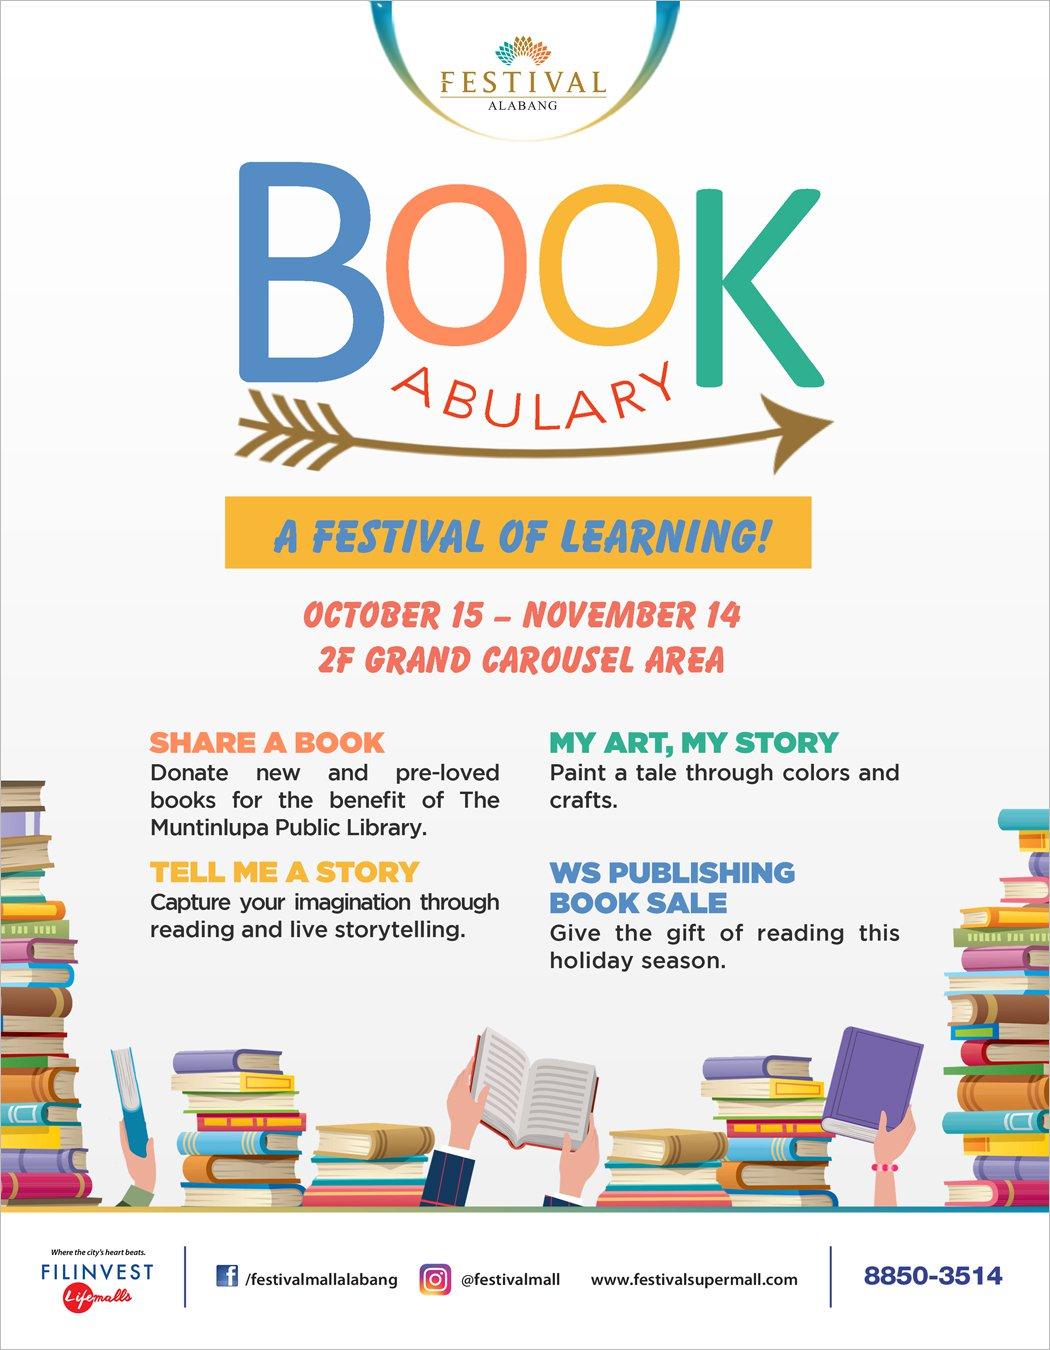 Bookabulary: A Festival of Learning (Festival Mall)